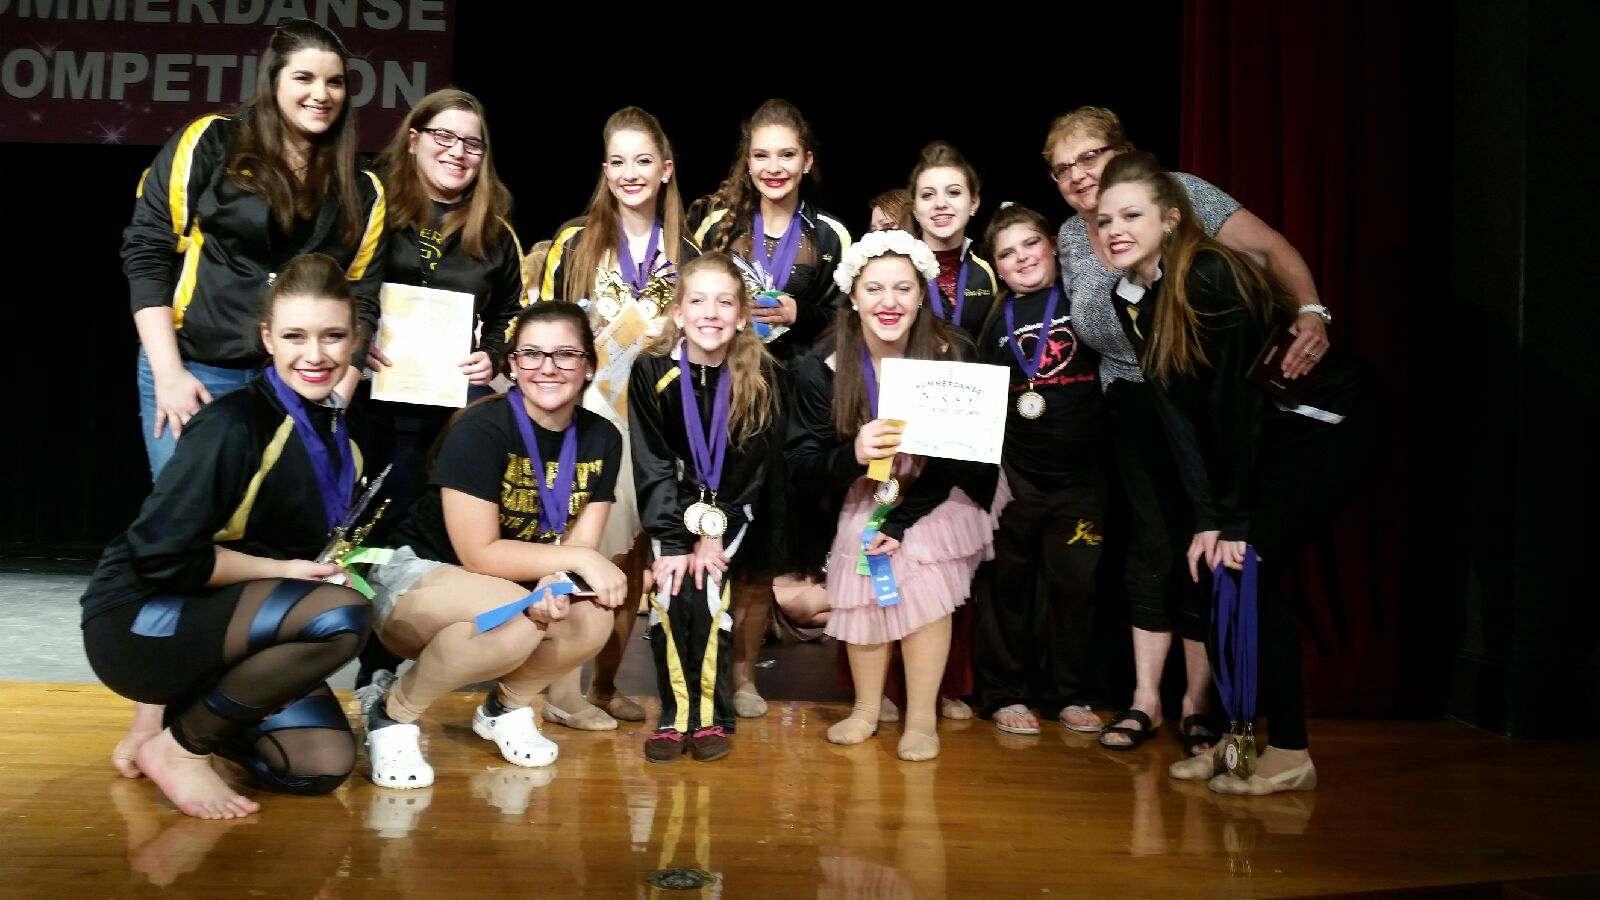 Niagara Falls Dance Studio  Wins Medals in Rochester